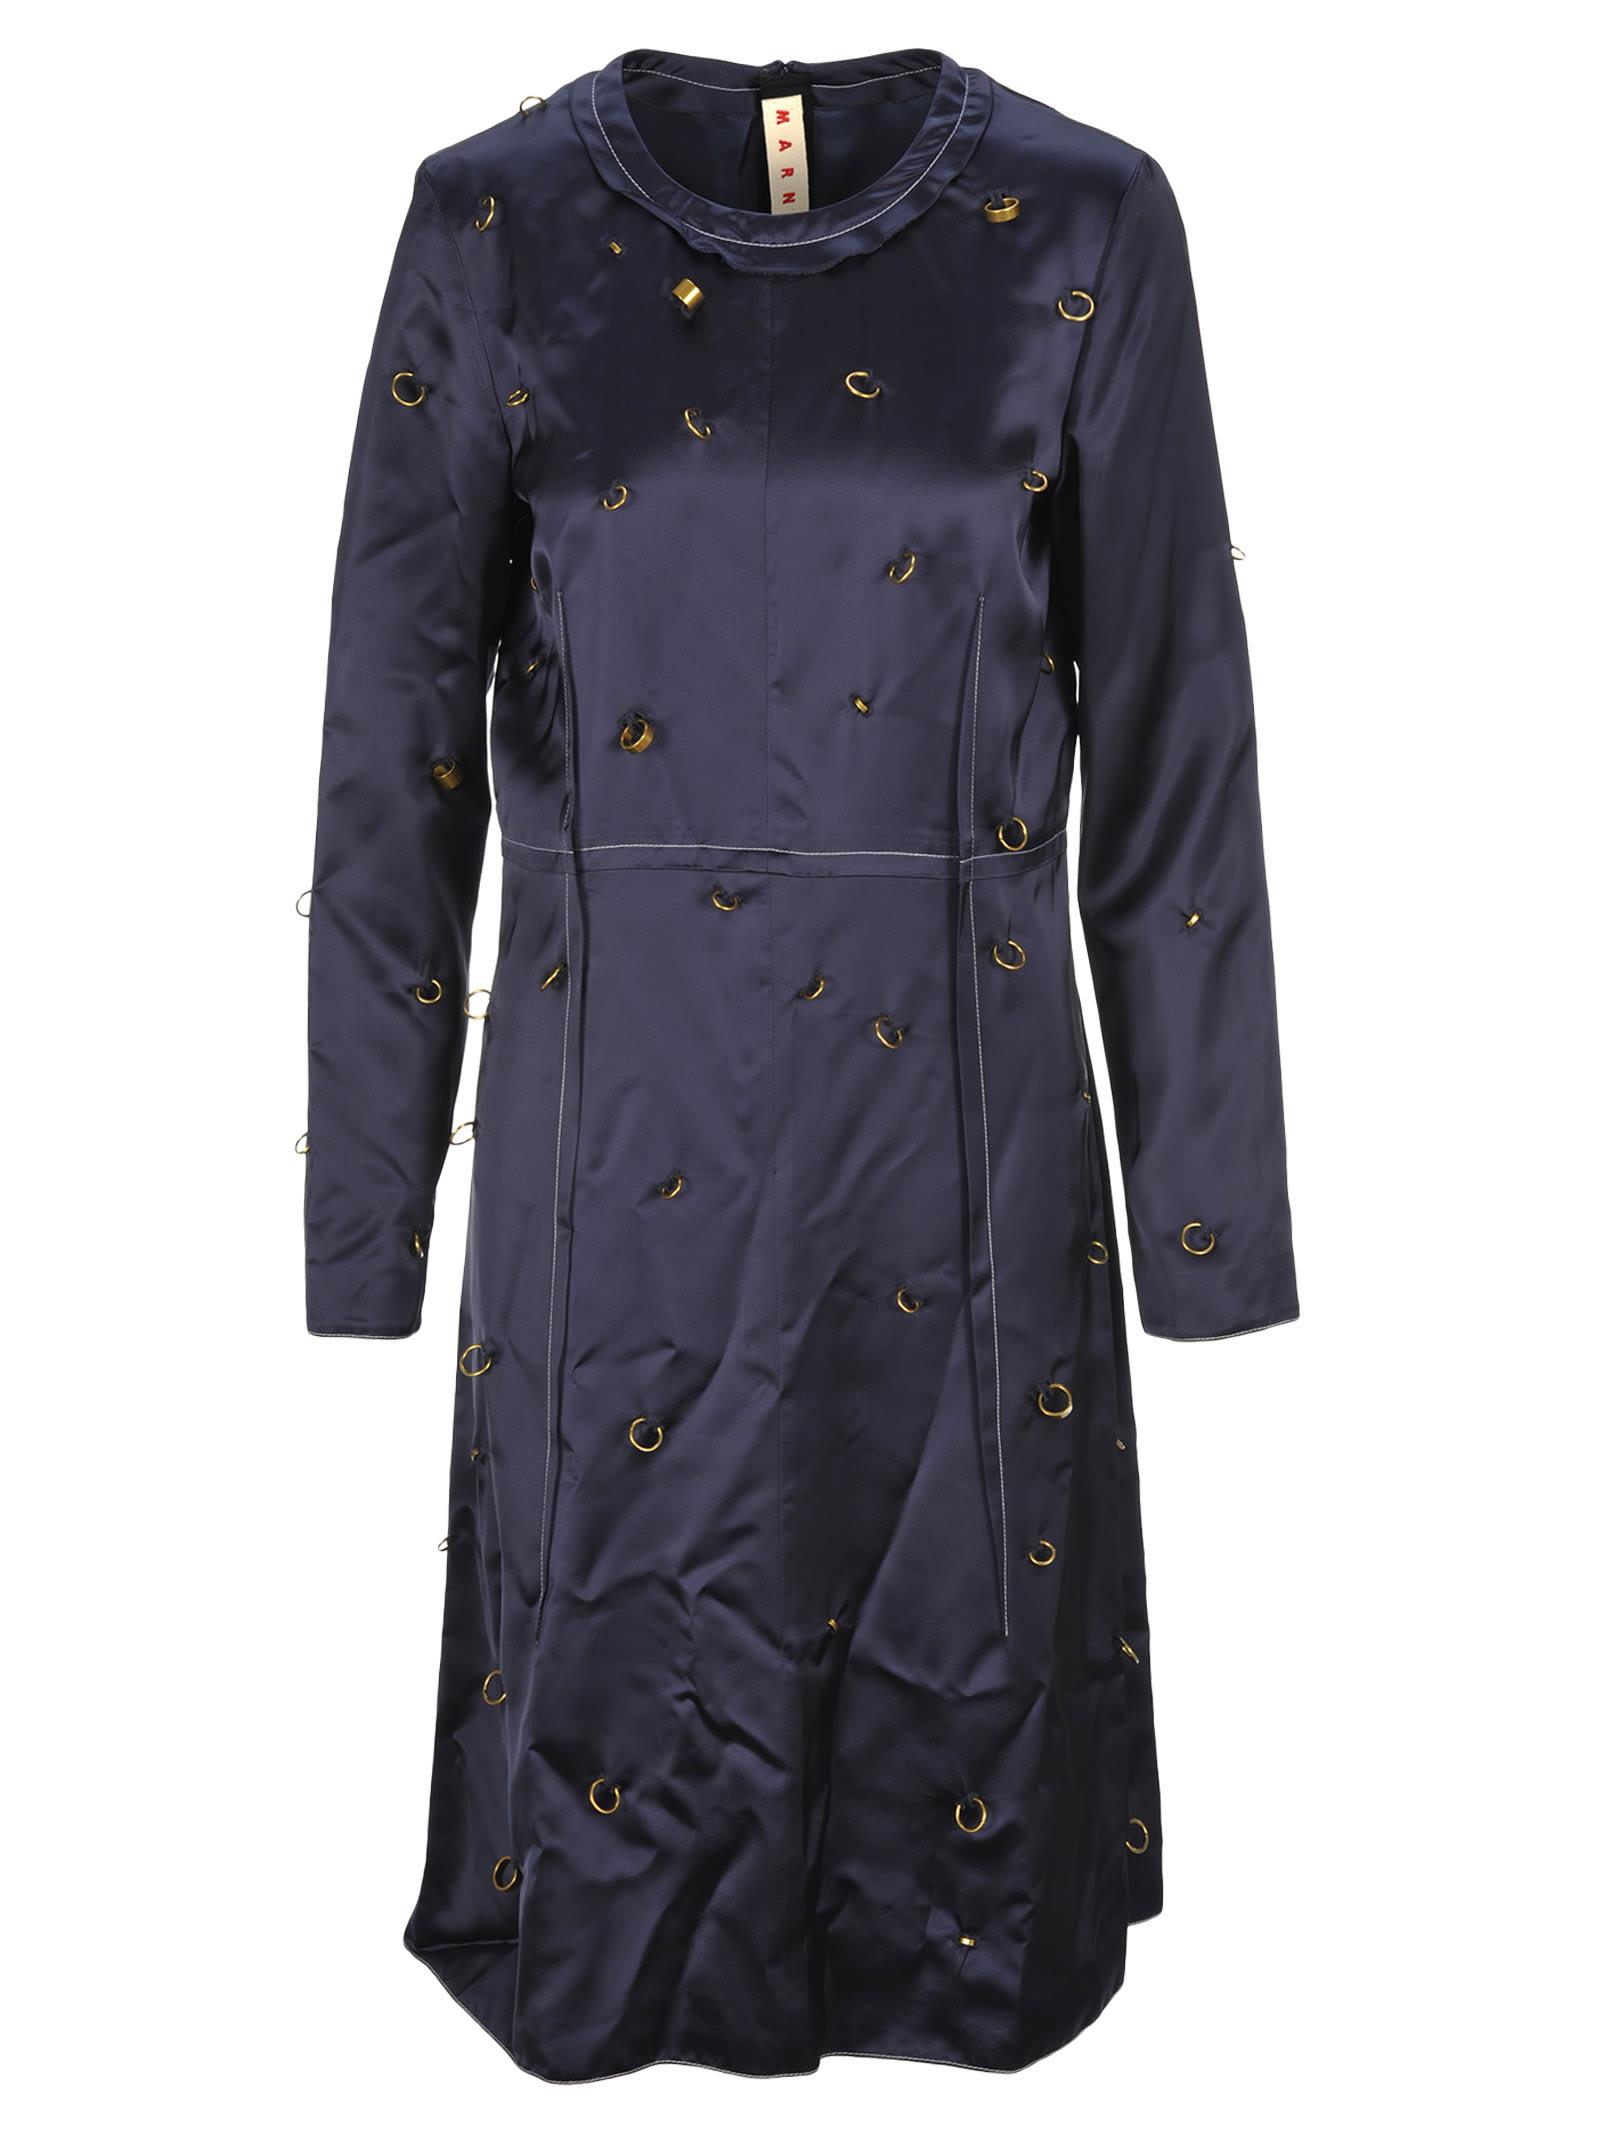 Marni Rings Detail Dress